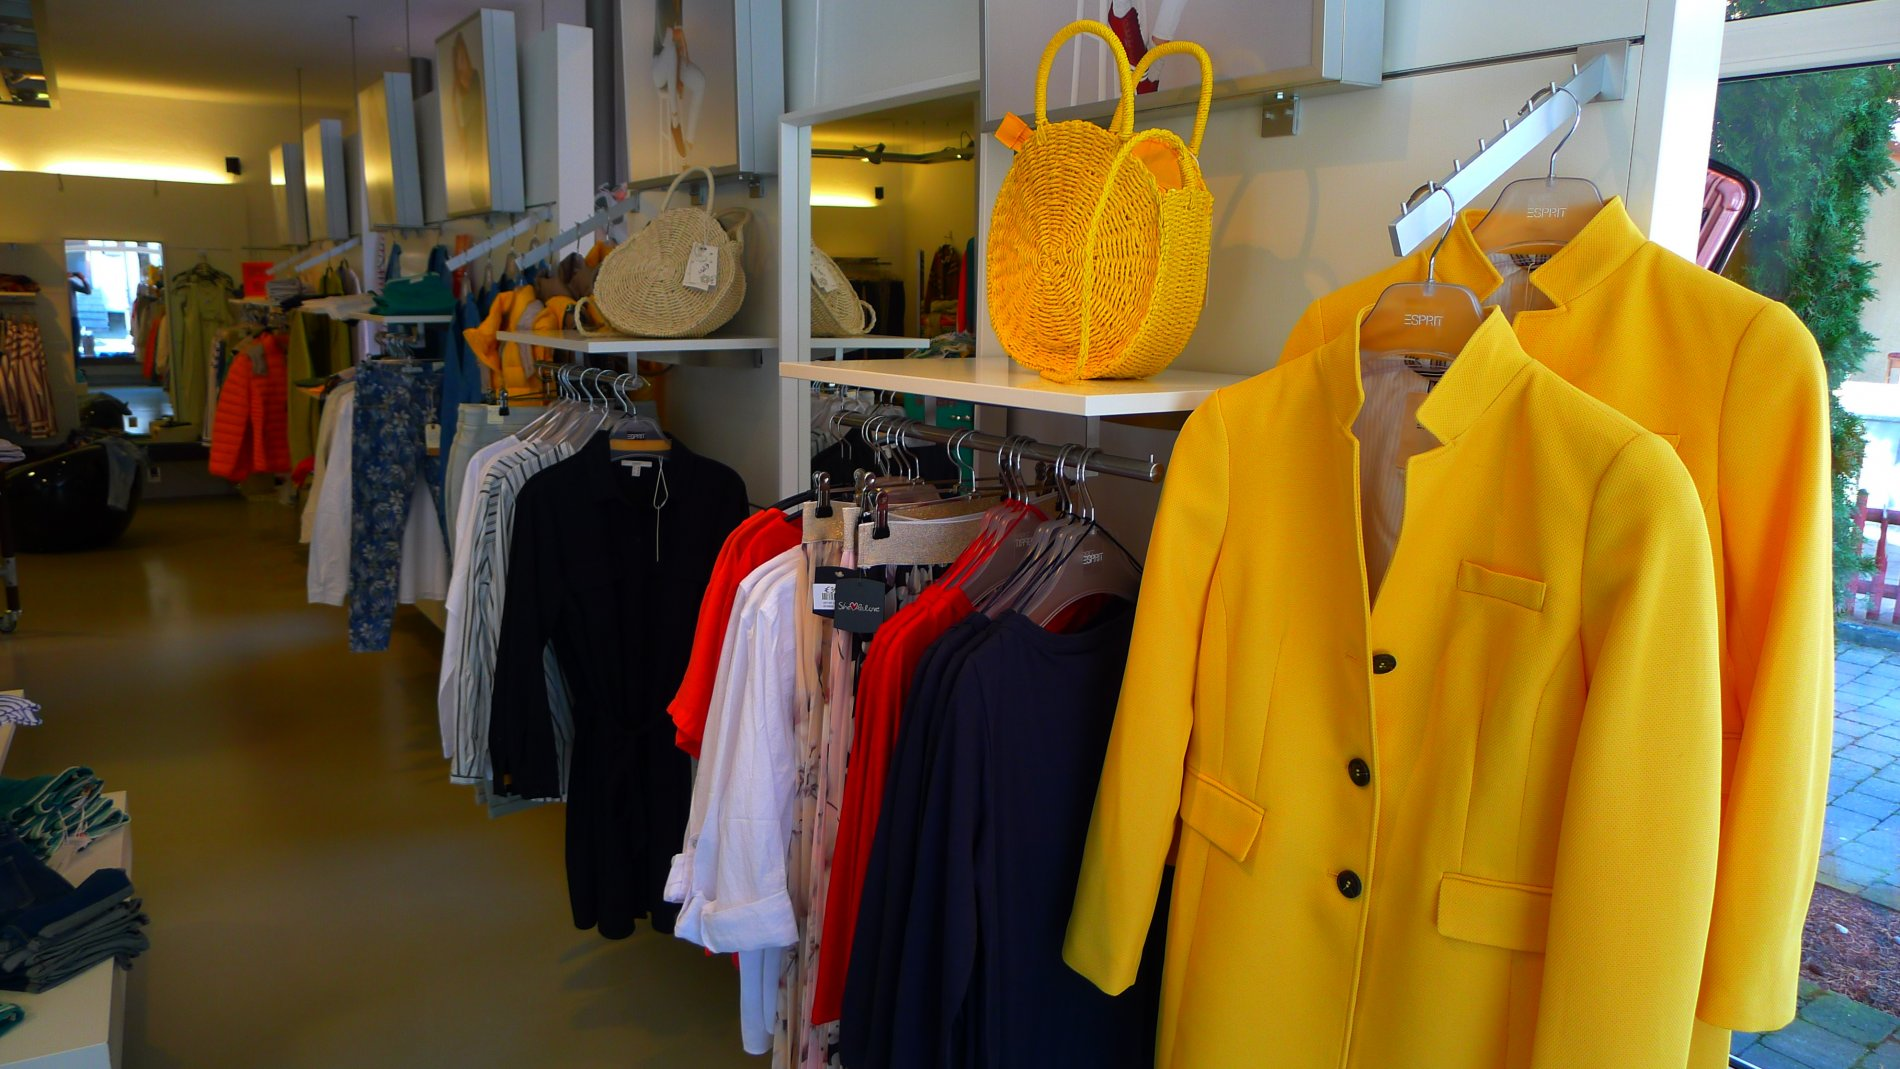 Lakritz Modegeschäft Kleiderangebot